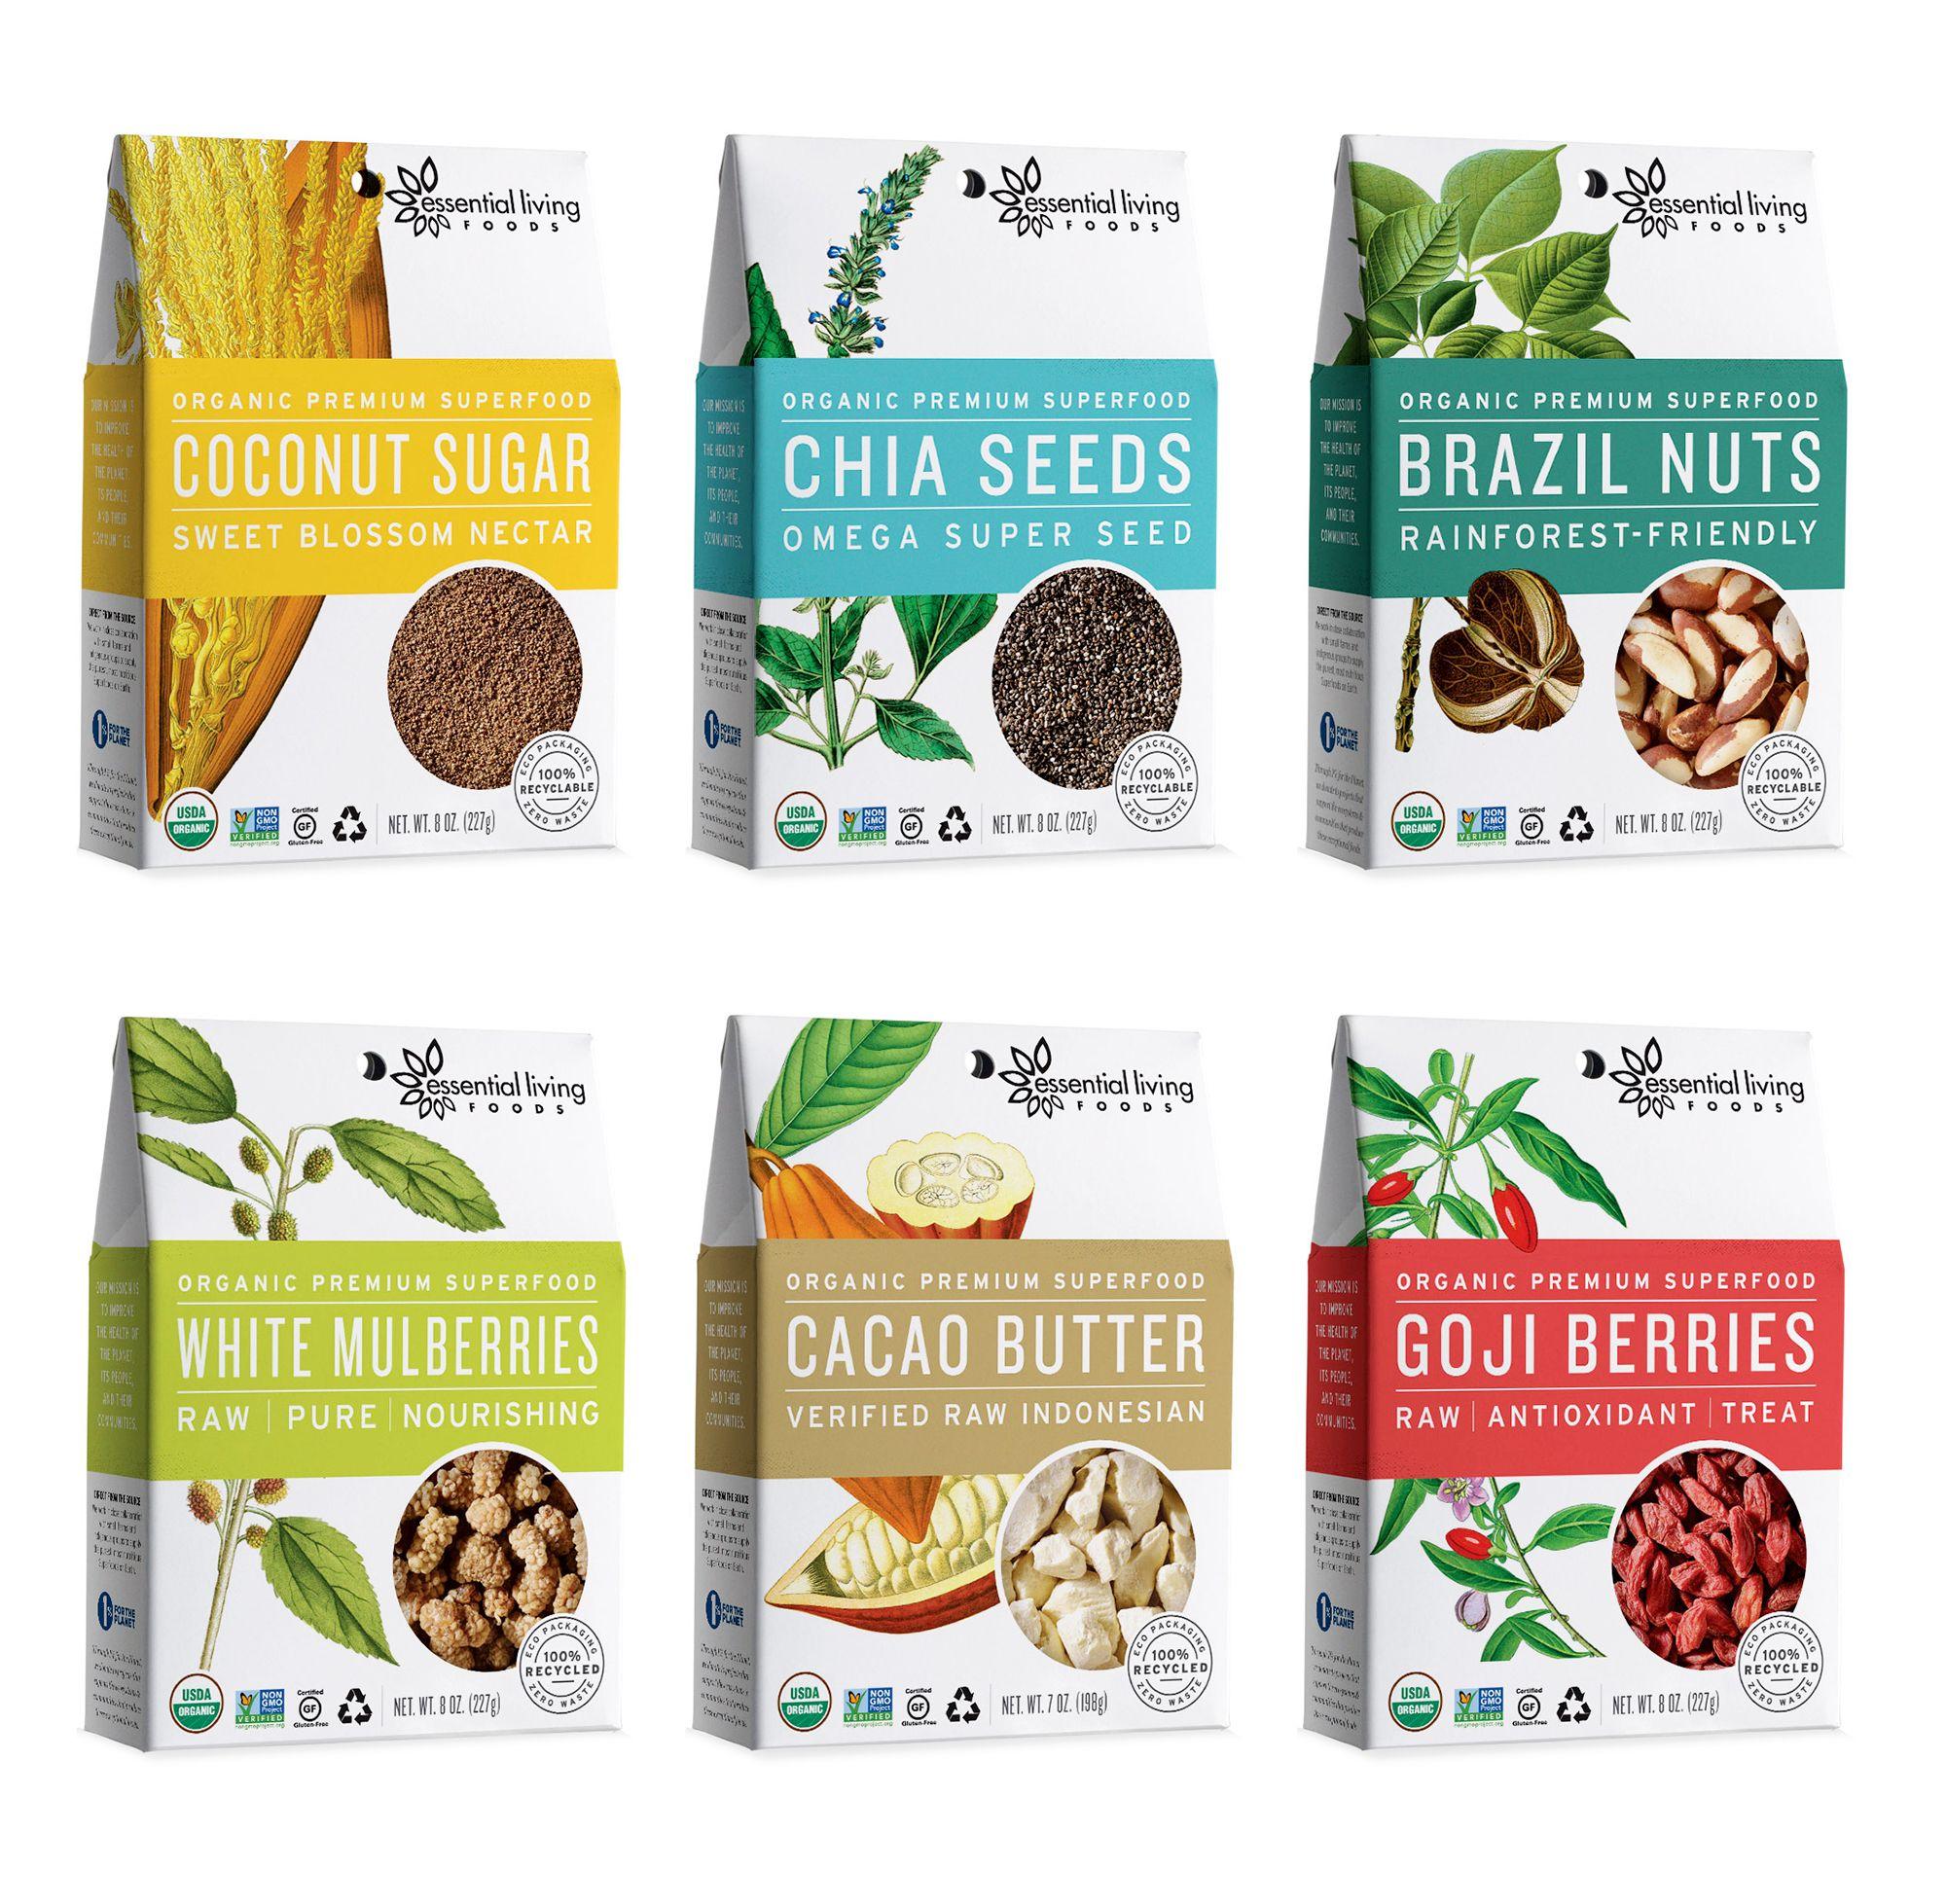 Merveilleux Essential Living Foods U2014 The Dieline   Package Design Resource